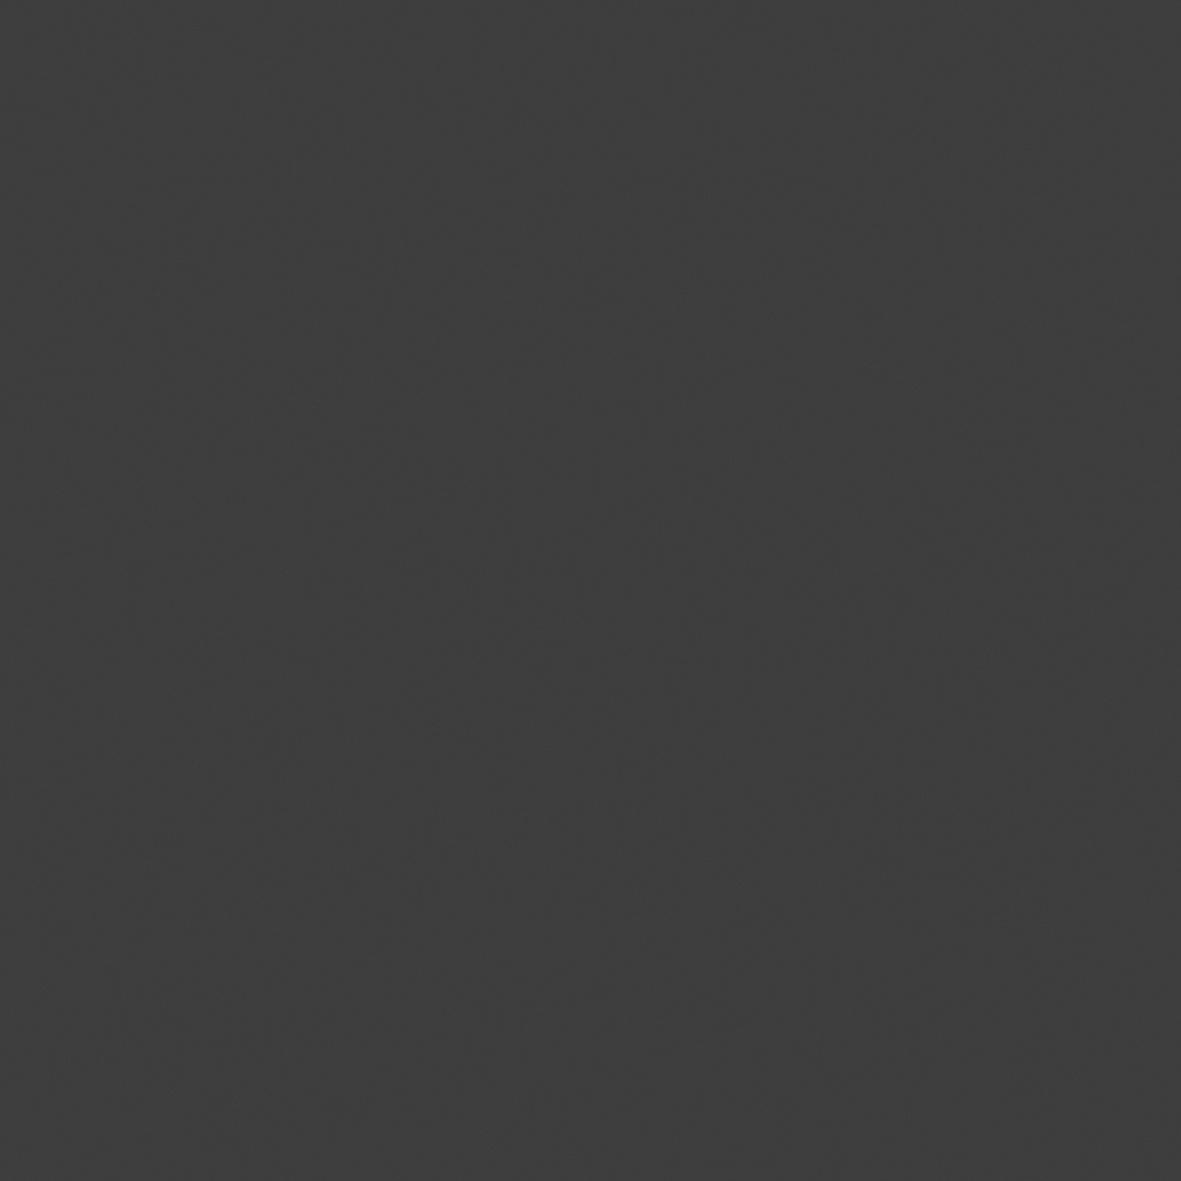 Kaisercraft Weave Texture Cardstock 12X12-Slate